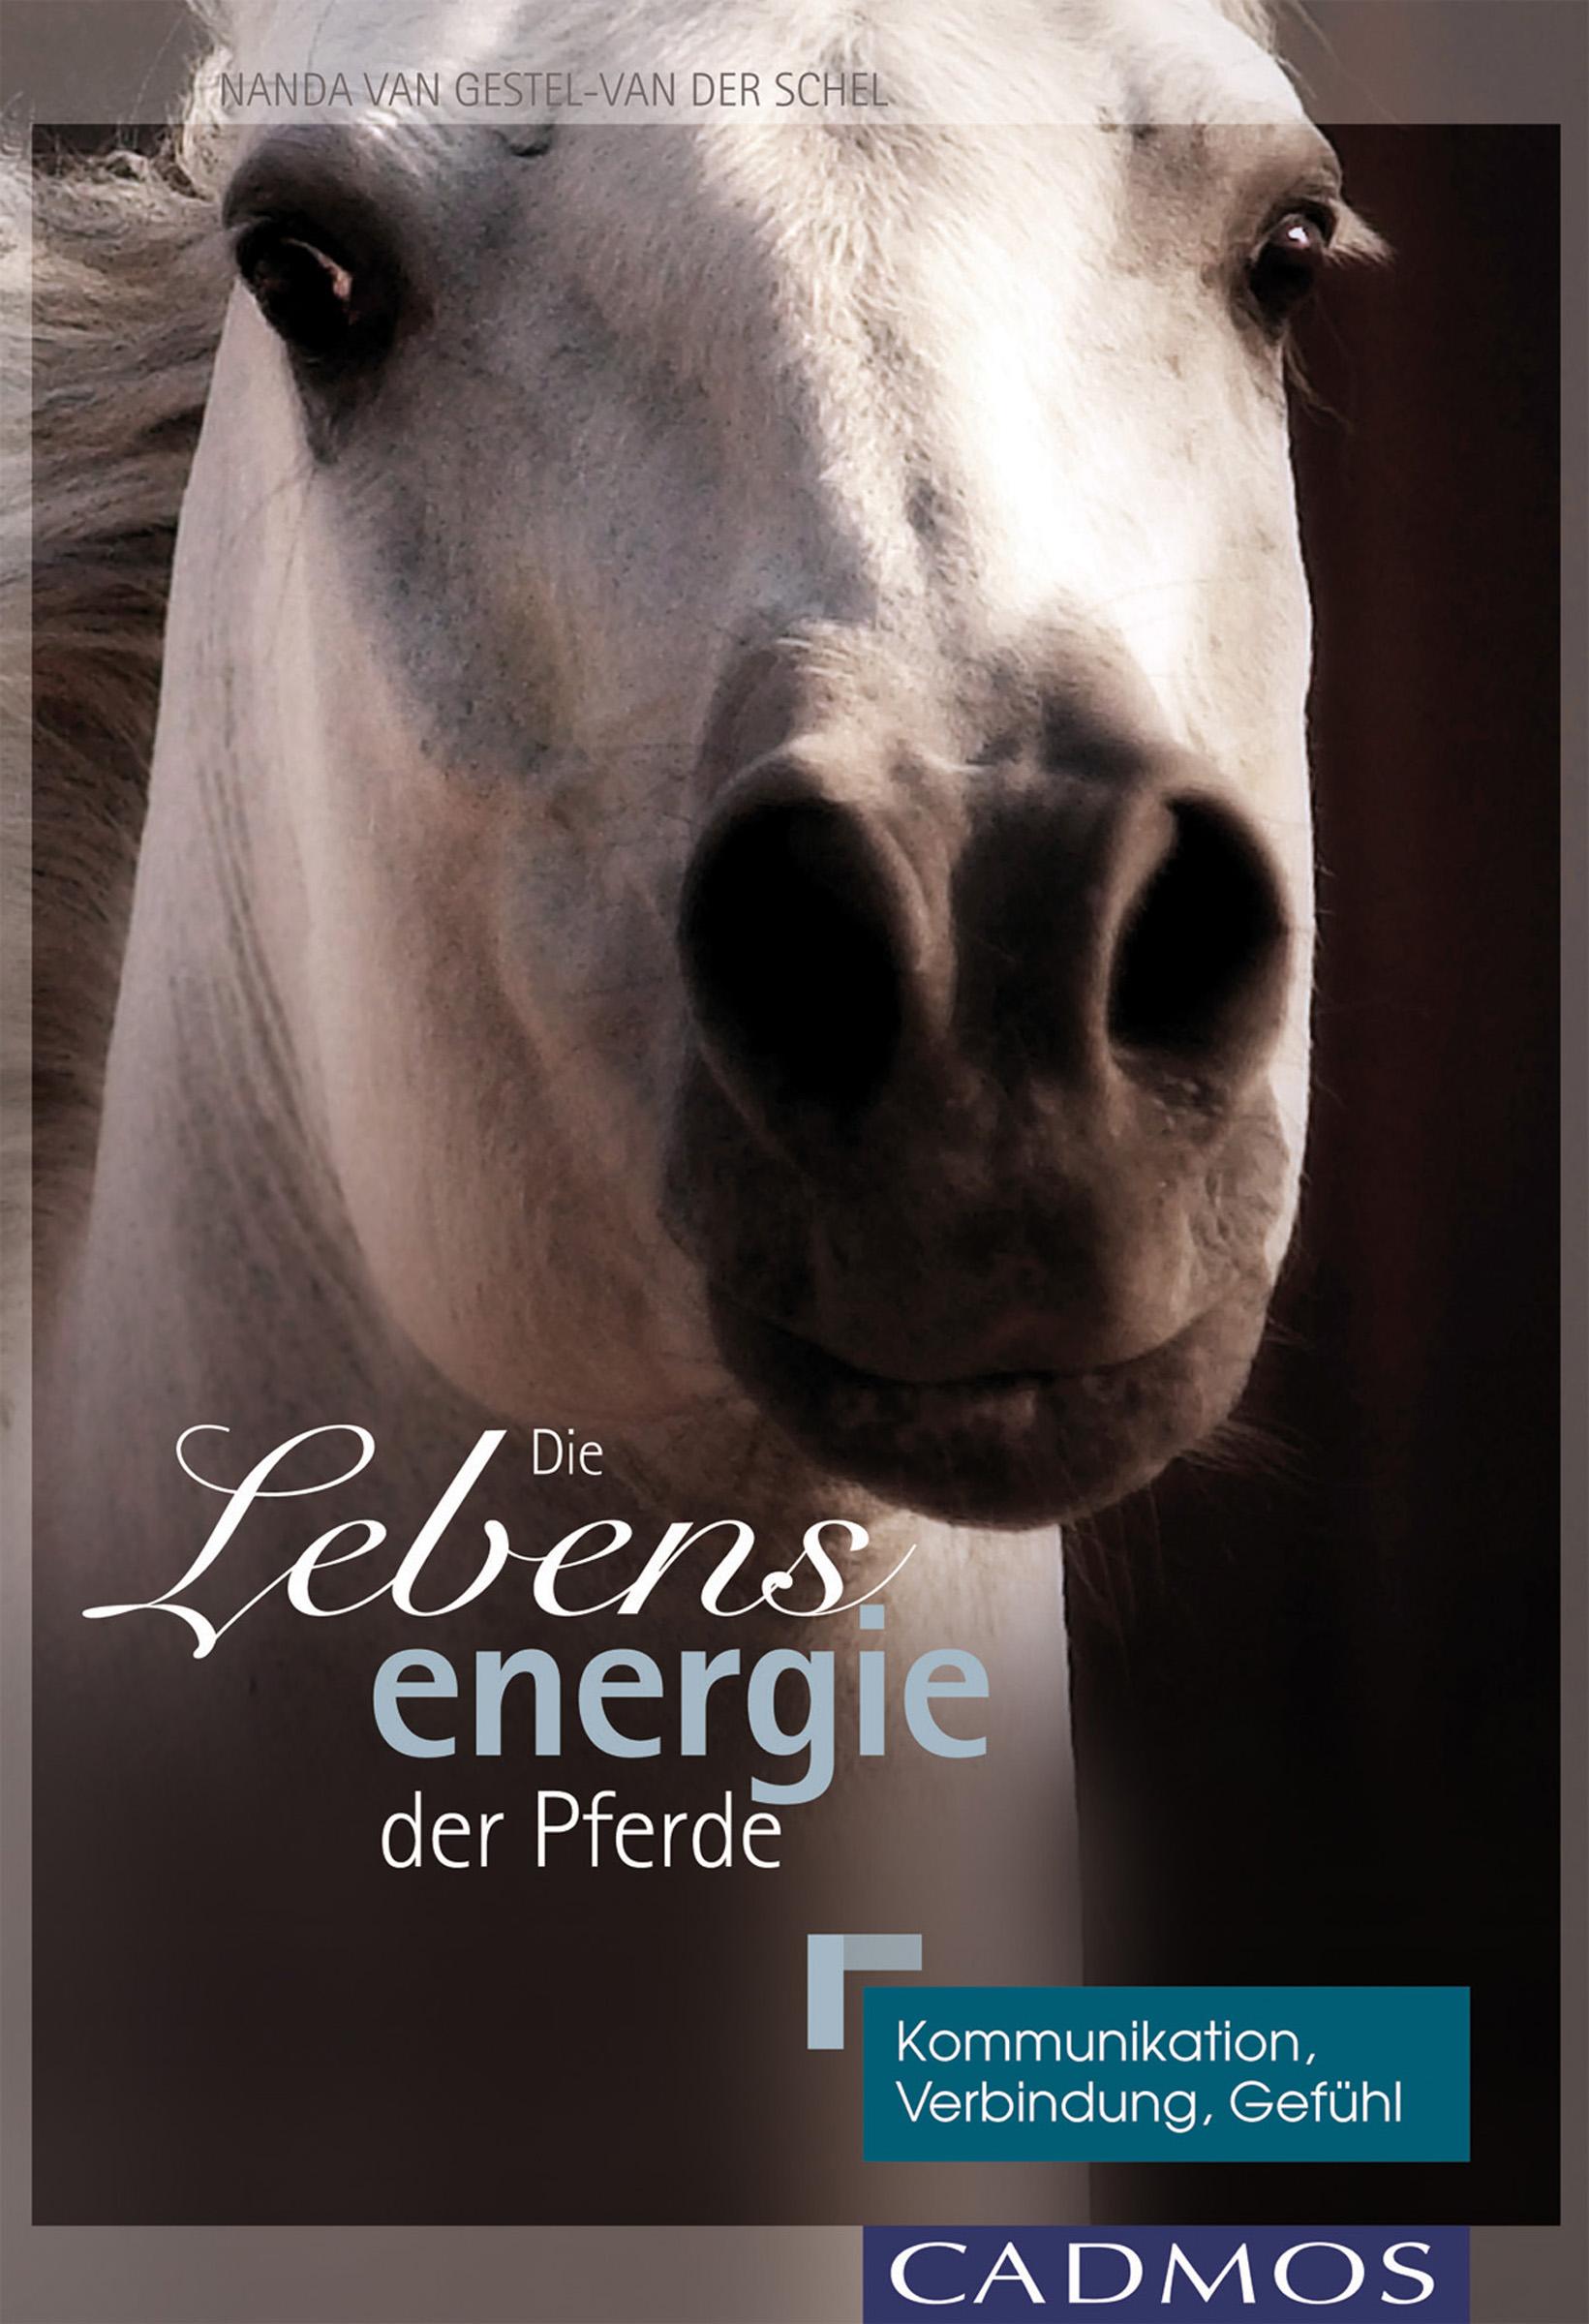 цена на Nanda van Gestel-van der Schel Die Lebensenergie der Pferde